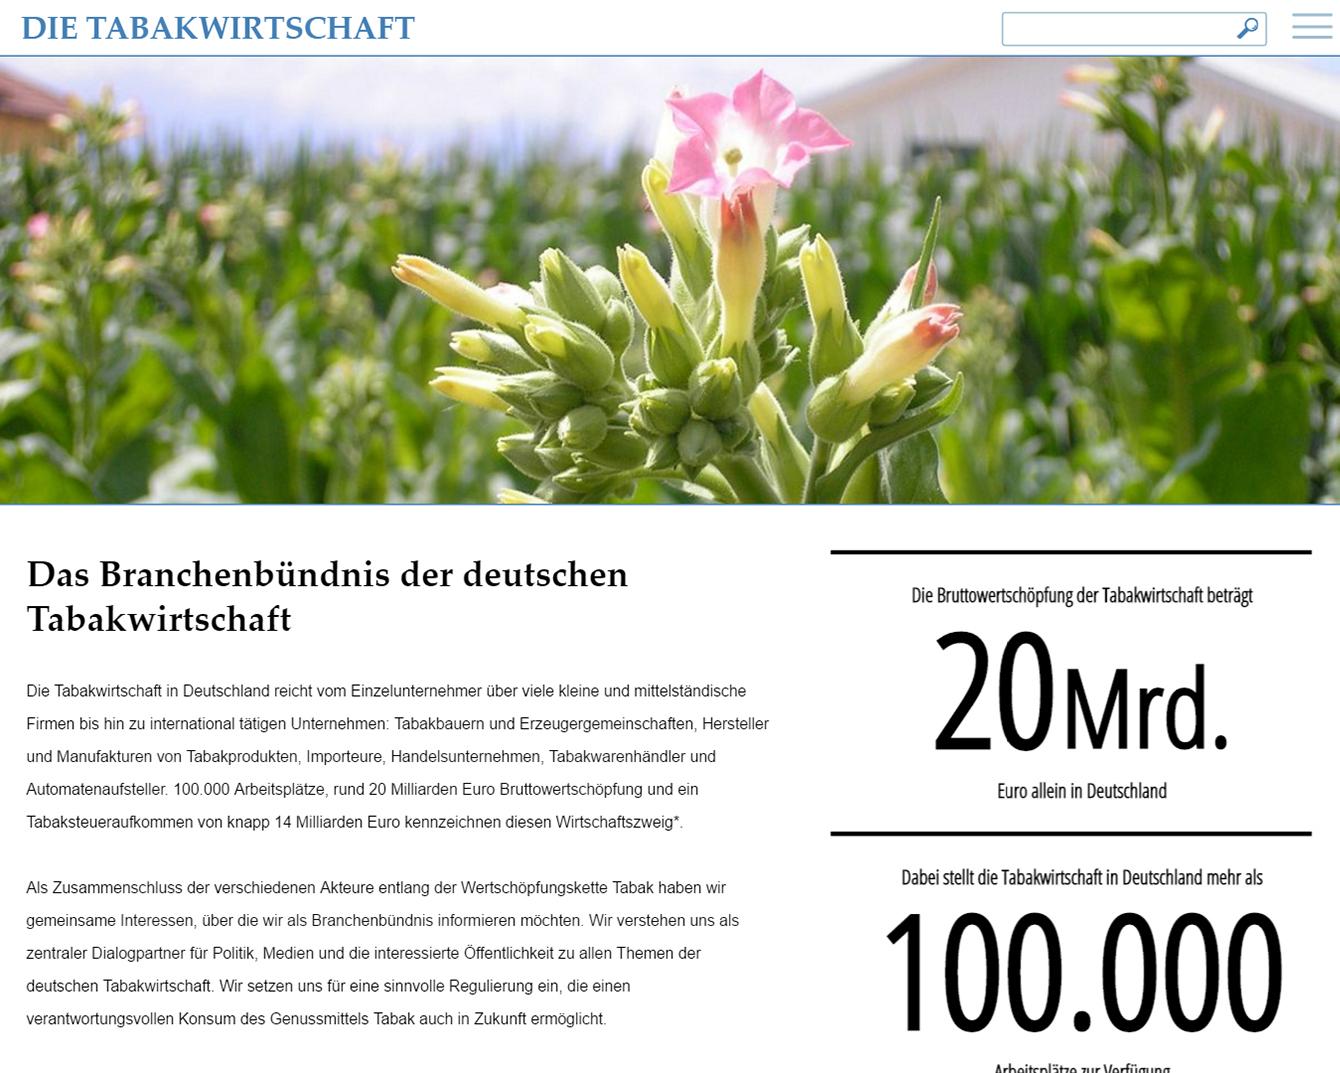 Tabakwirtschaft_Foto